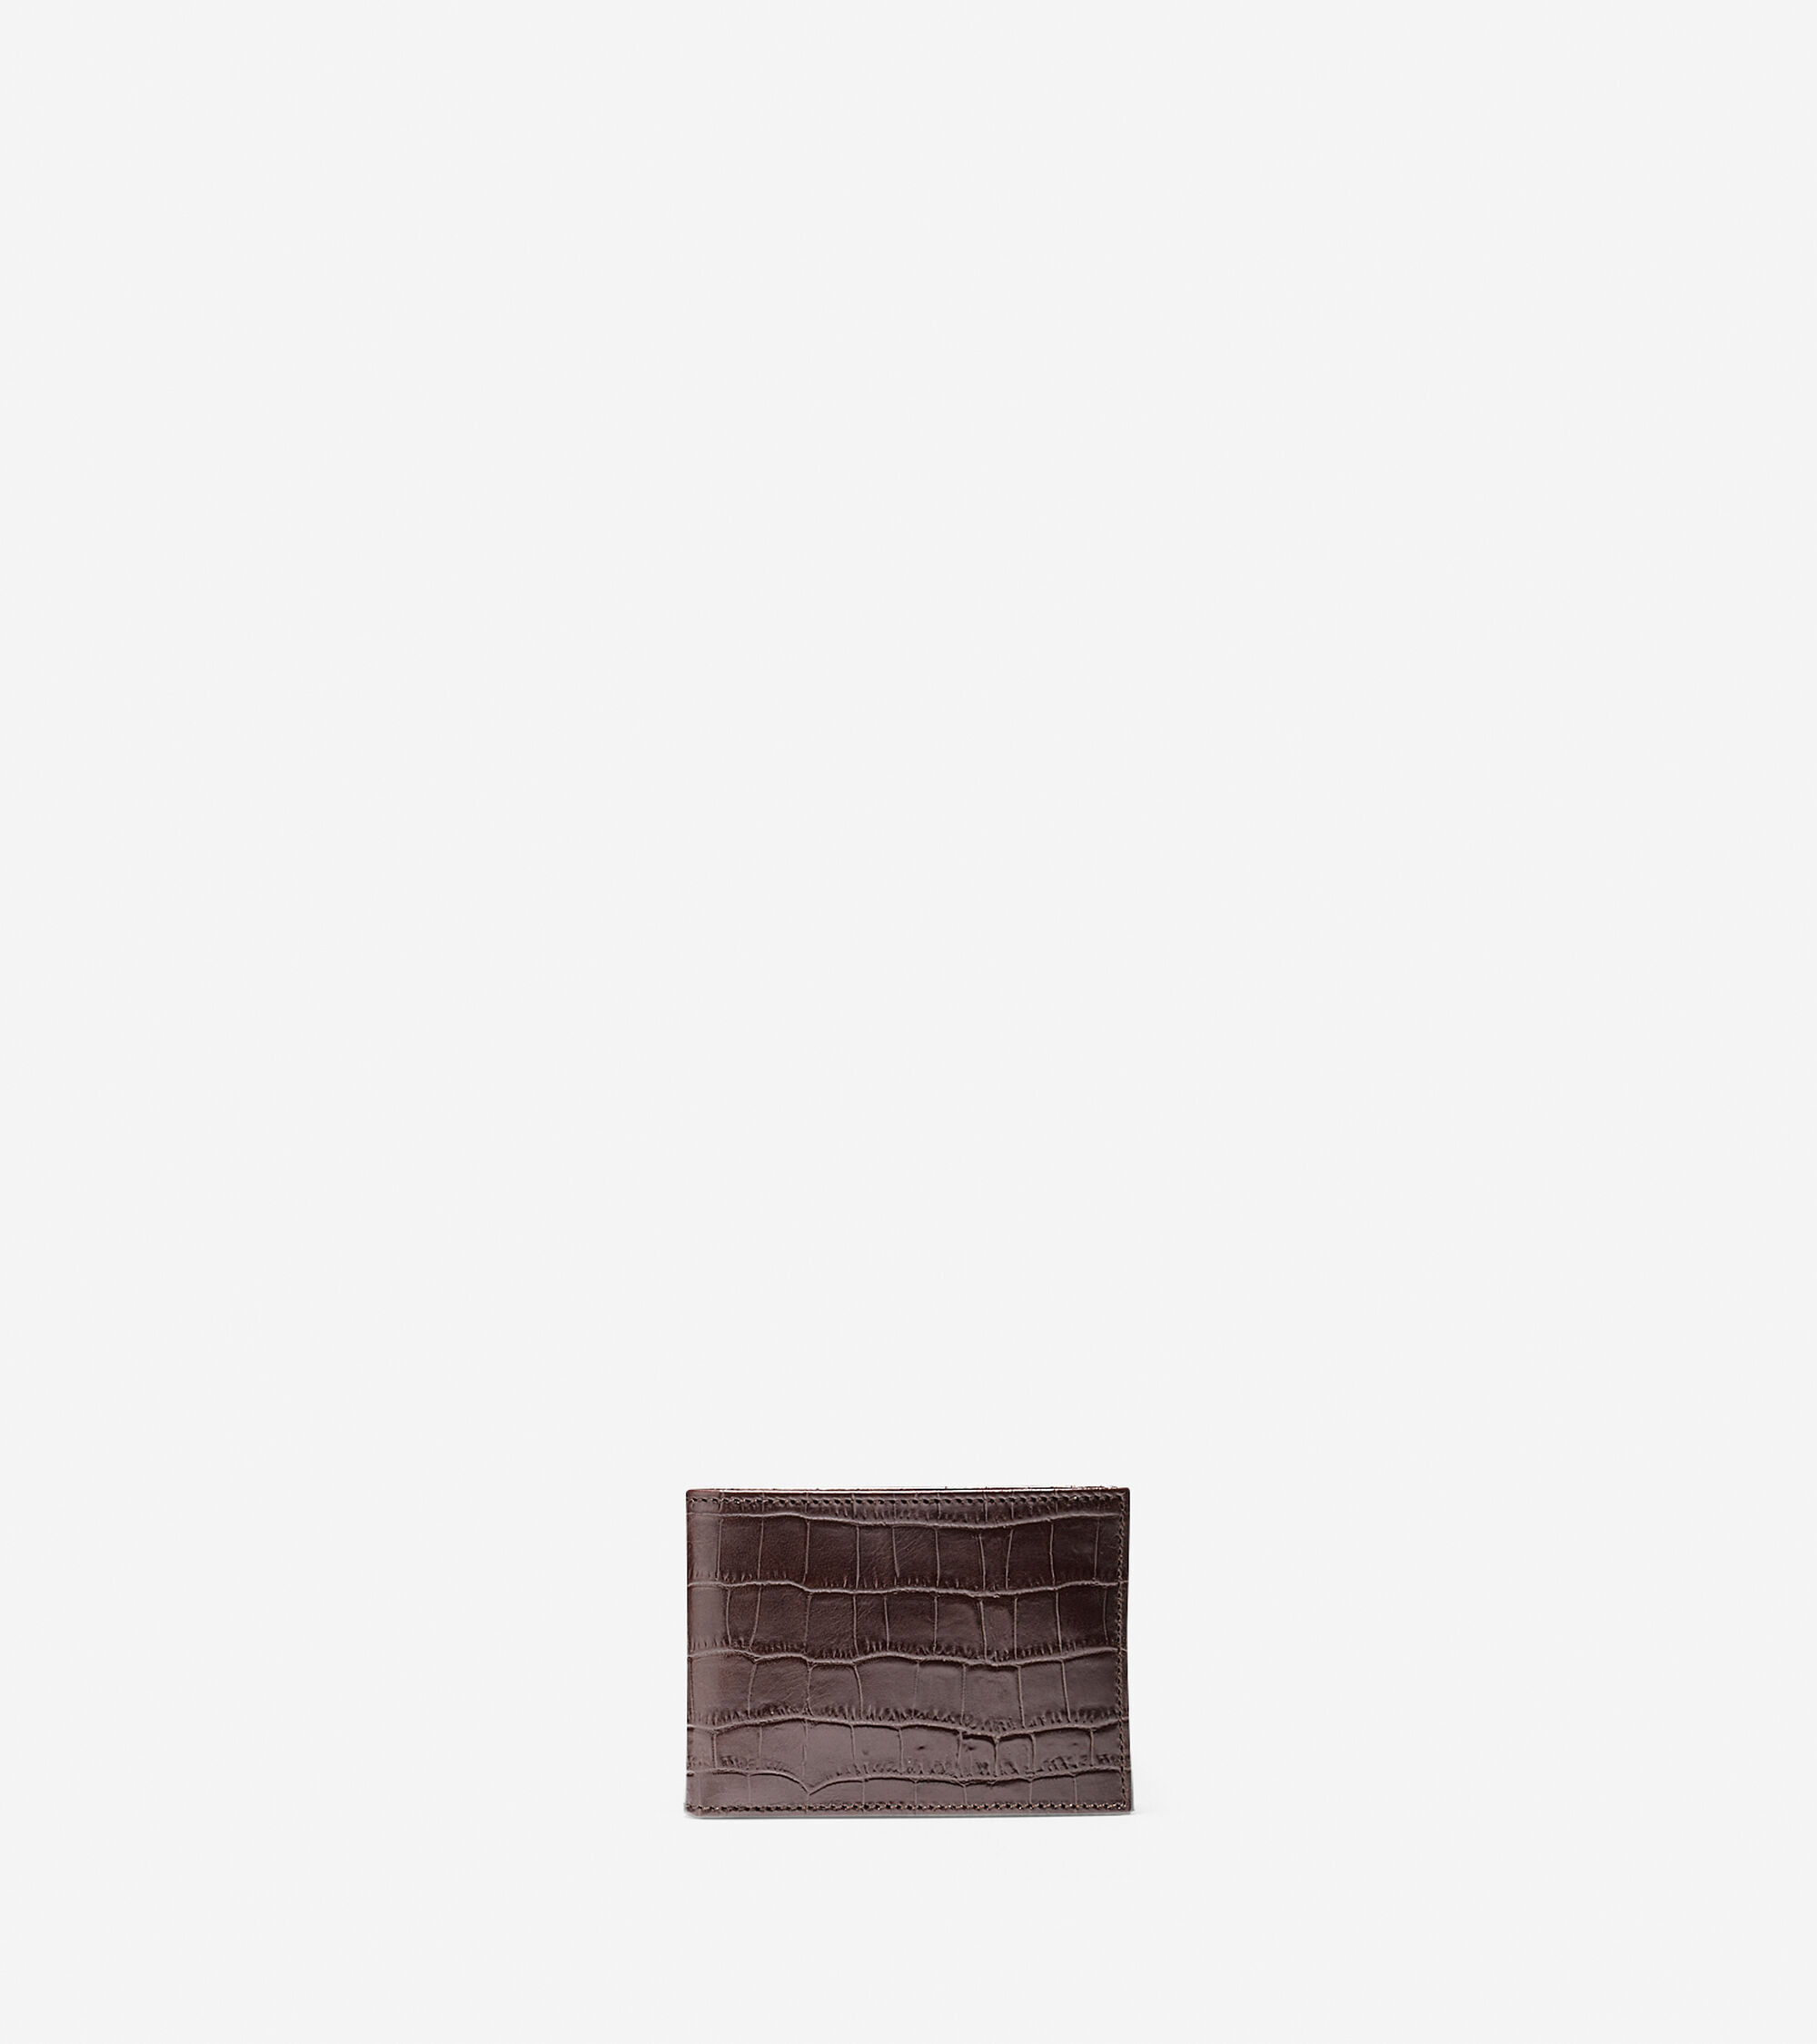 Accessories > Embossed Croc Slim Billfold Wallet